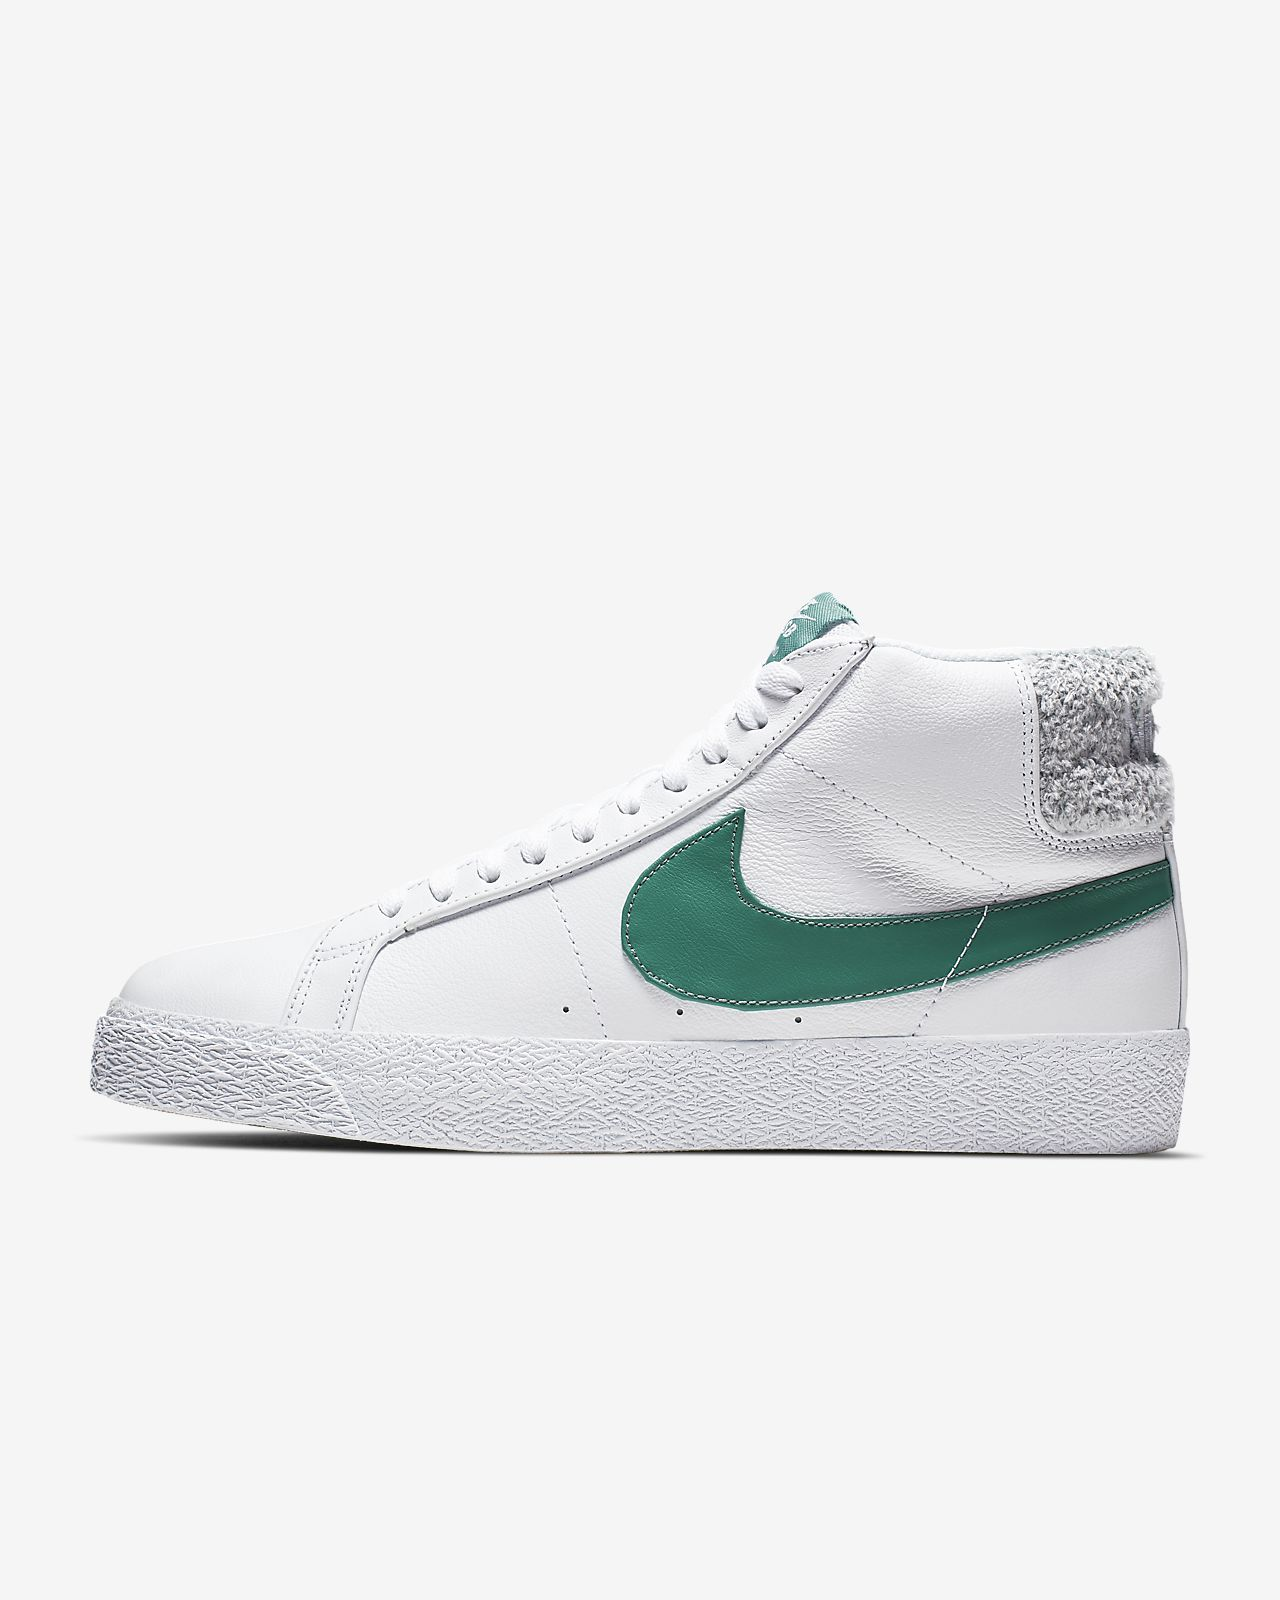 Nike Blazer Low Premium White Green For Sale